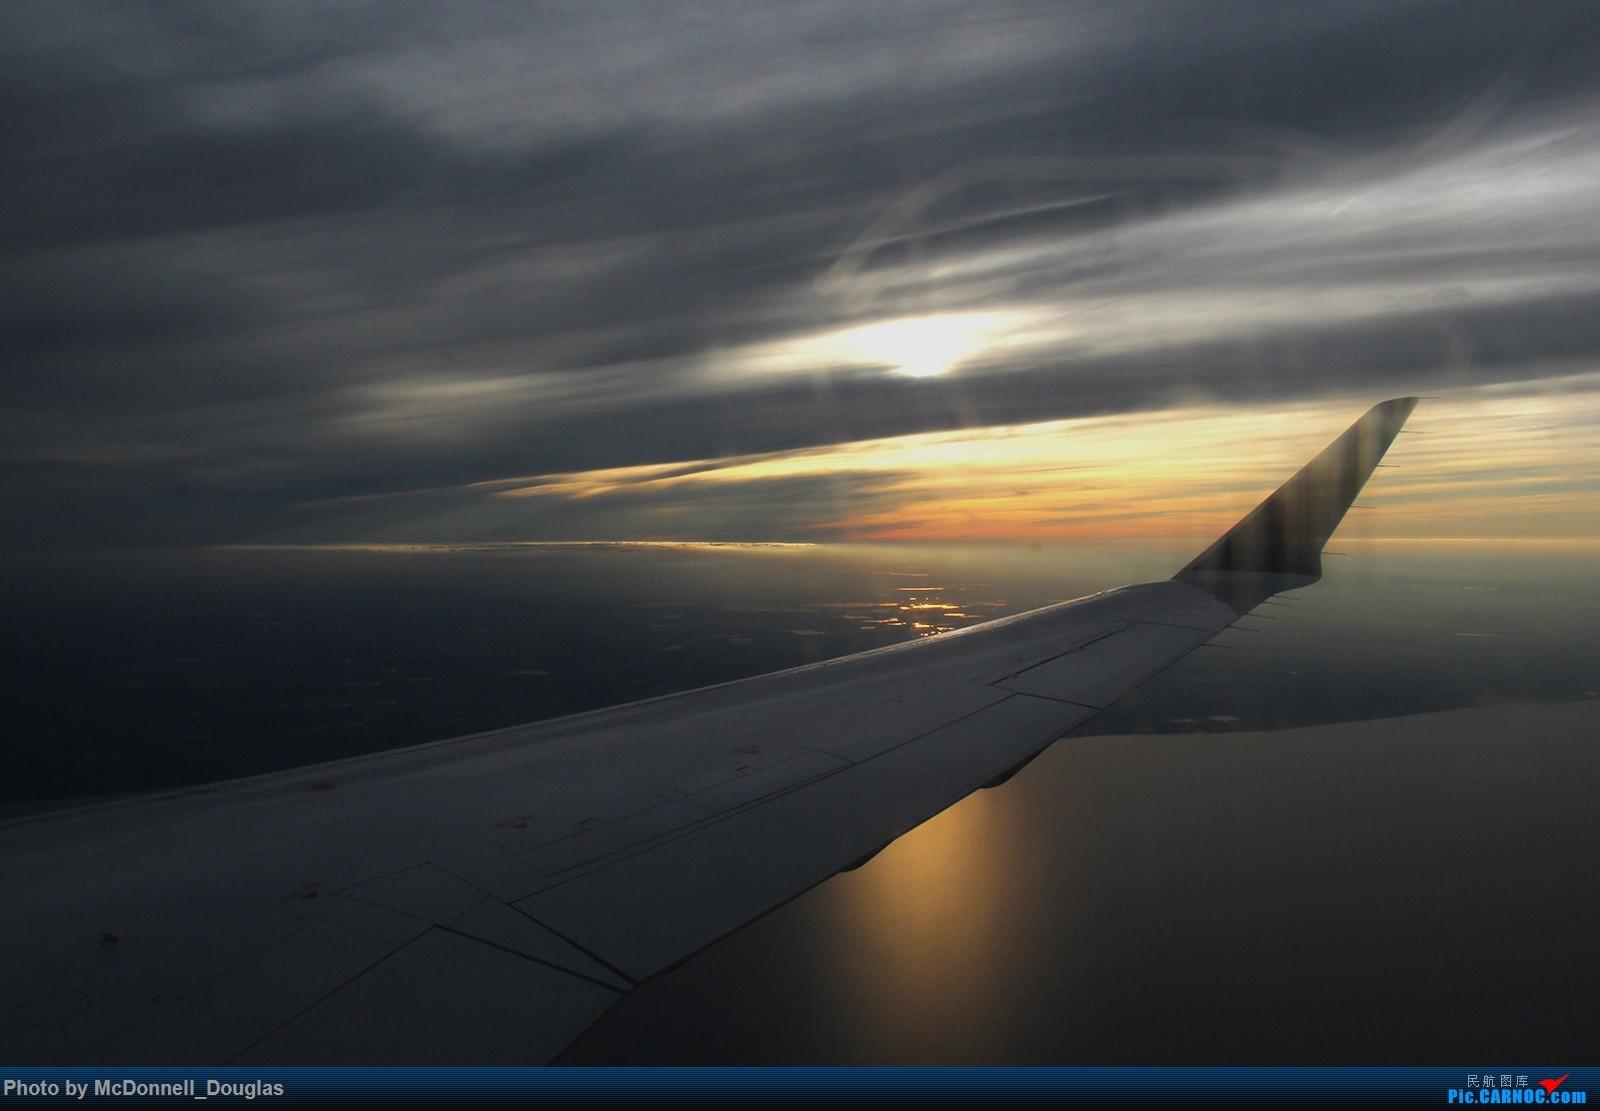 Re:[原创]【上海飞友会】图会很多,也有很多驾驶舱,杂七杂八的美帝,梦寐以求的圣马丁,这更绝不弃贴【驾驶舱已出现】 CANADAIR CL-602-2D24 REGIONAL JET CRJ-900LR N554CA